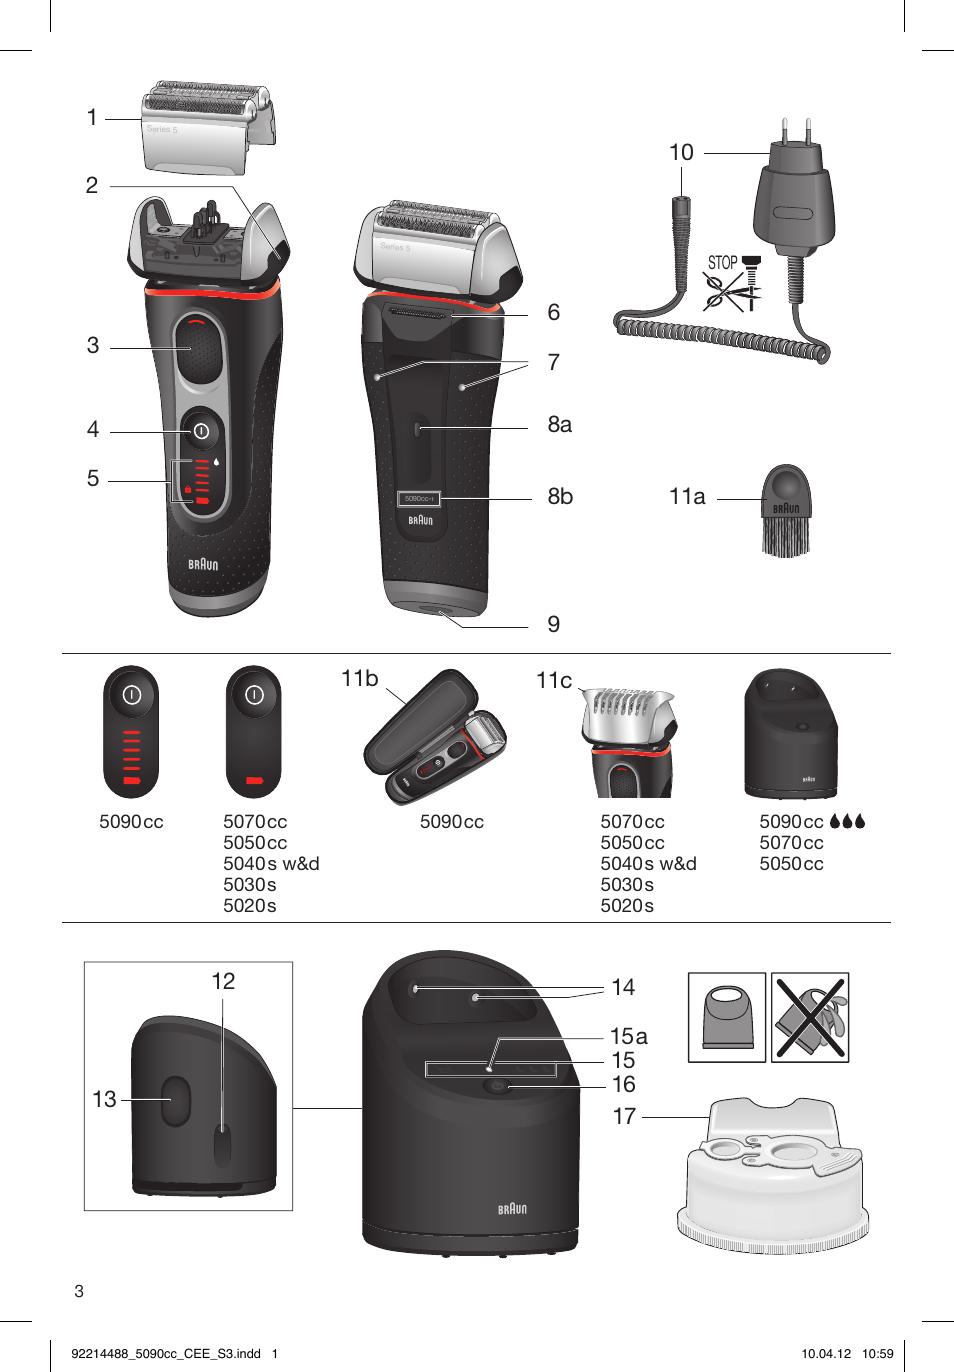 92214488 5090cc cee s3 braun 5090cc series 5 user manual braun series 5 user guide braun series 5 user manual